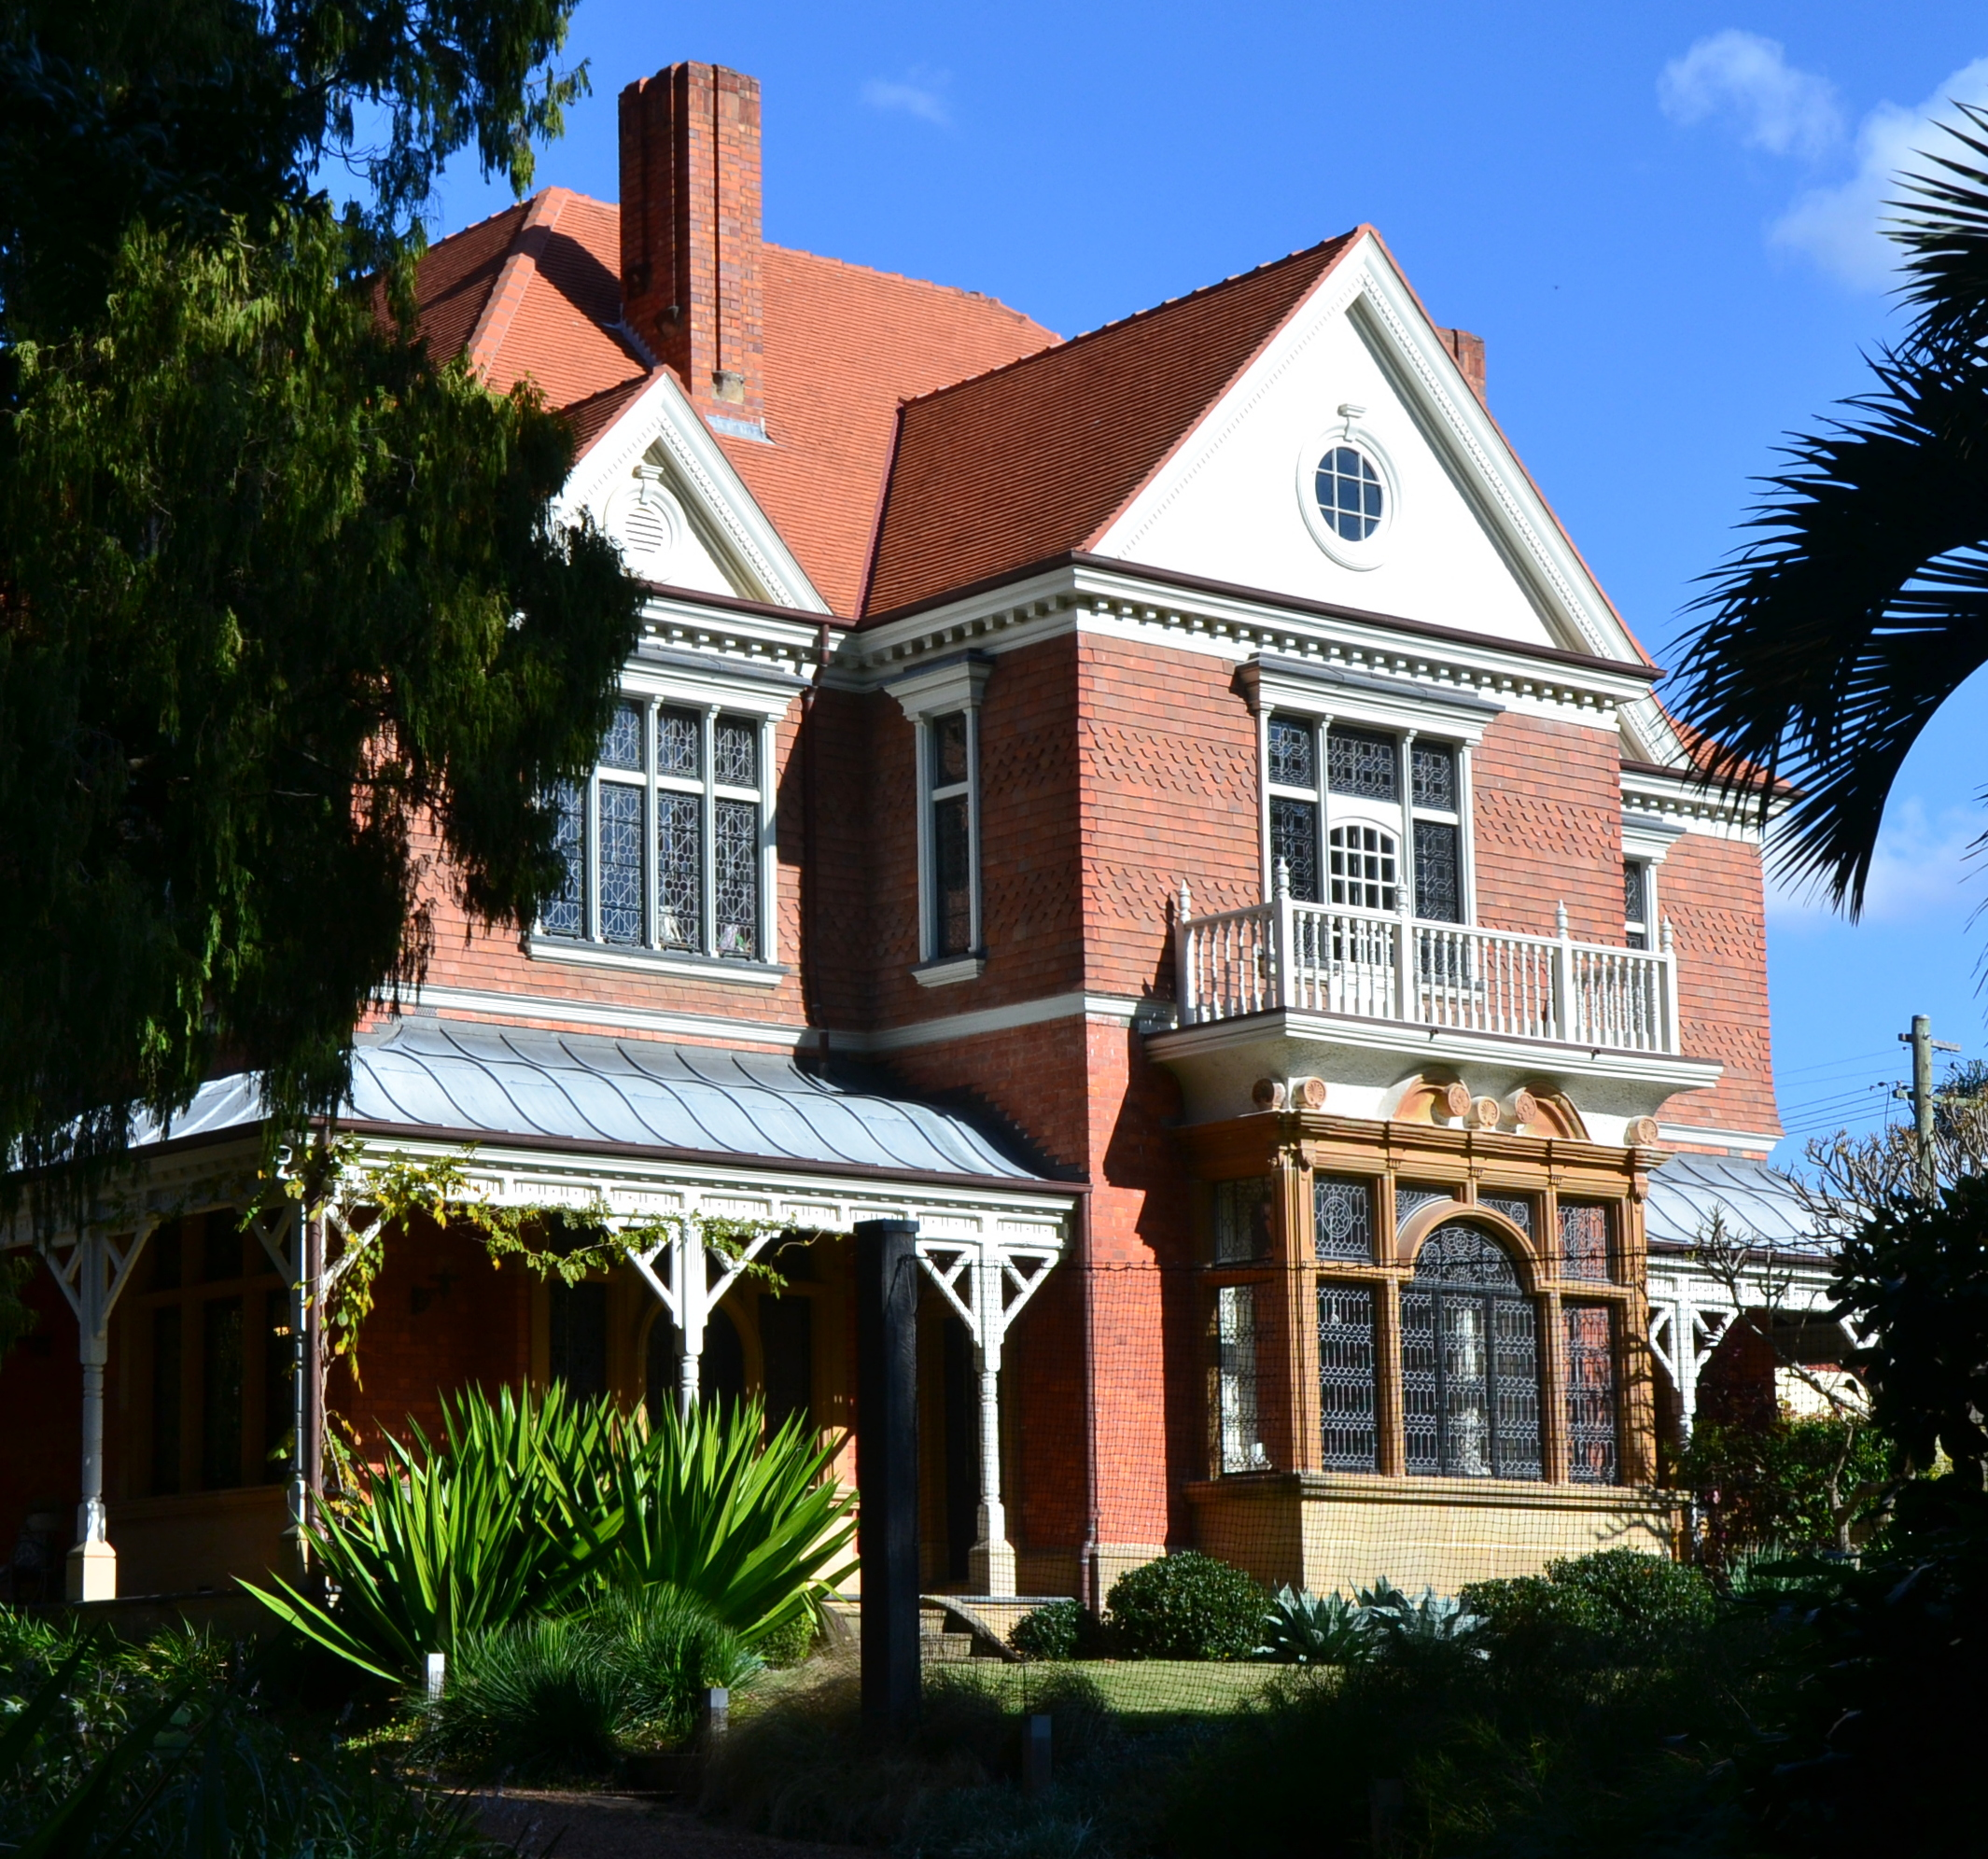 Bellevue Hill New South Wales Familypedia FANDOM Powered By Wikia - Bellevue hill house